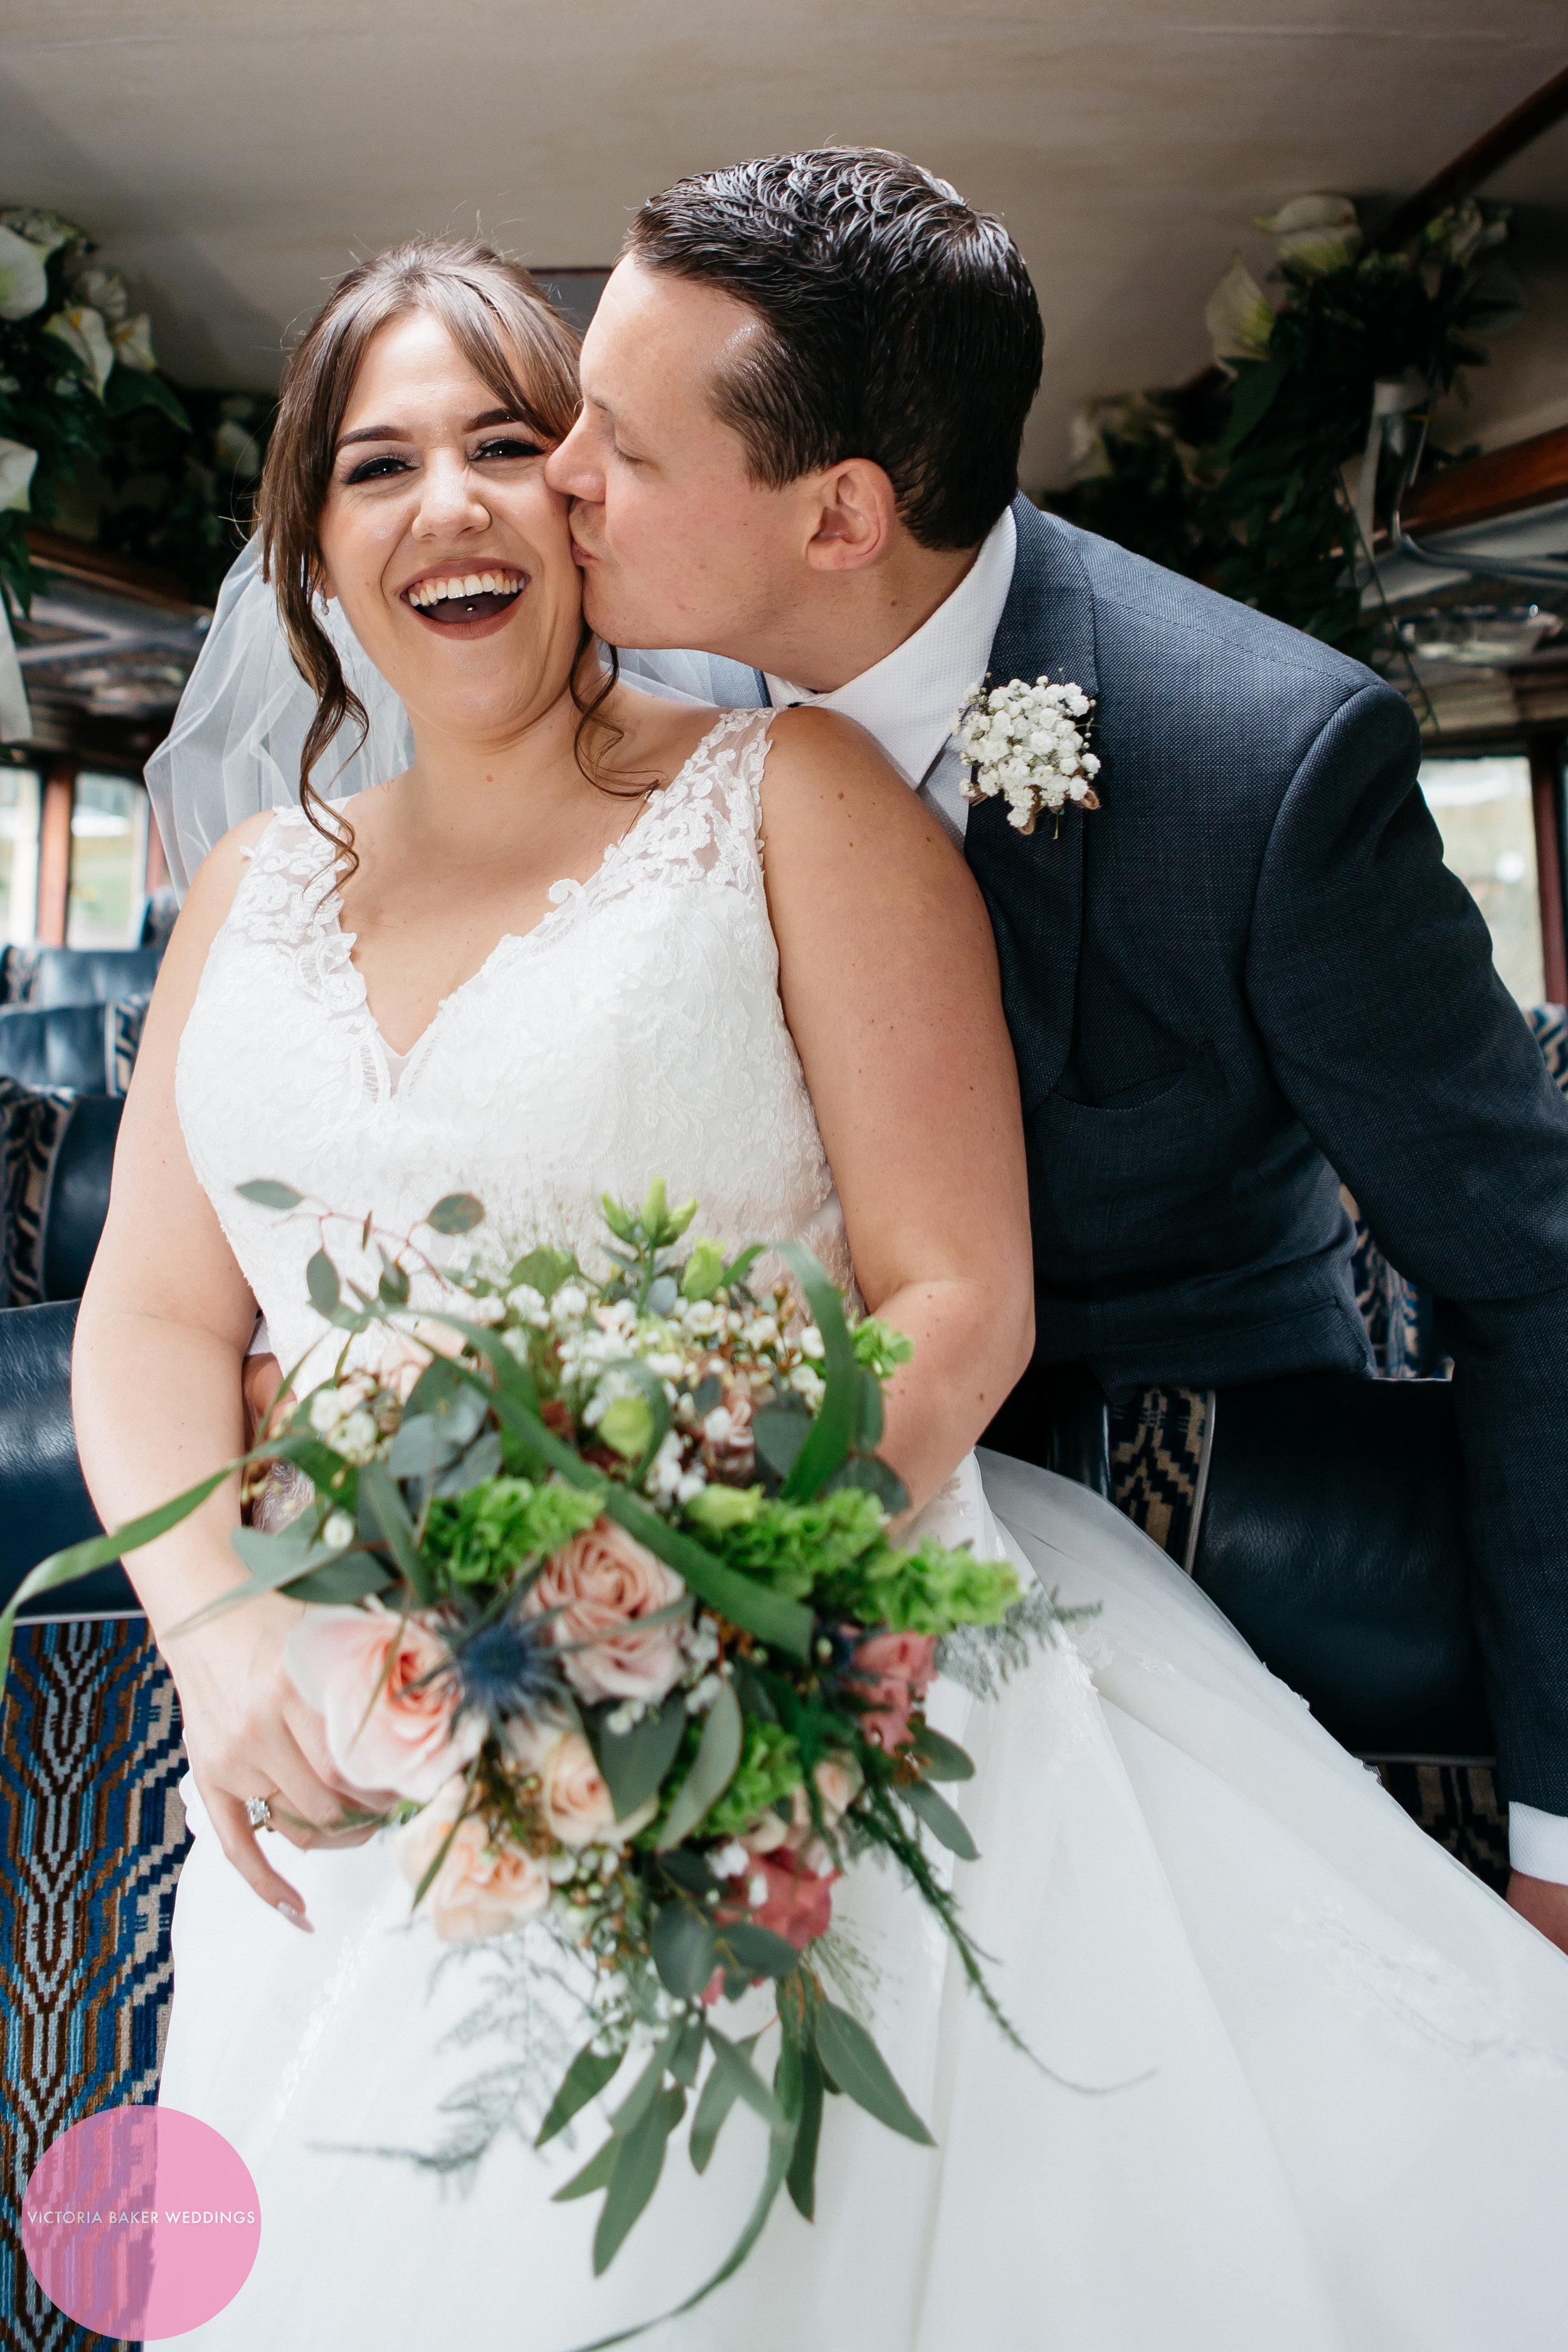 Bride and Groom just married| Wedding photography Leeds